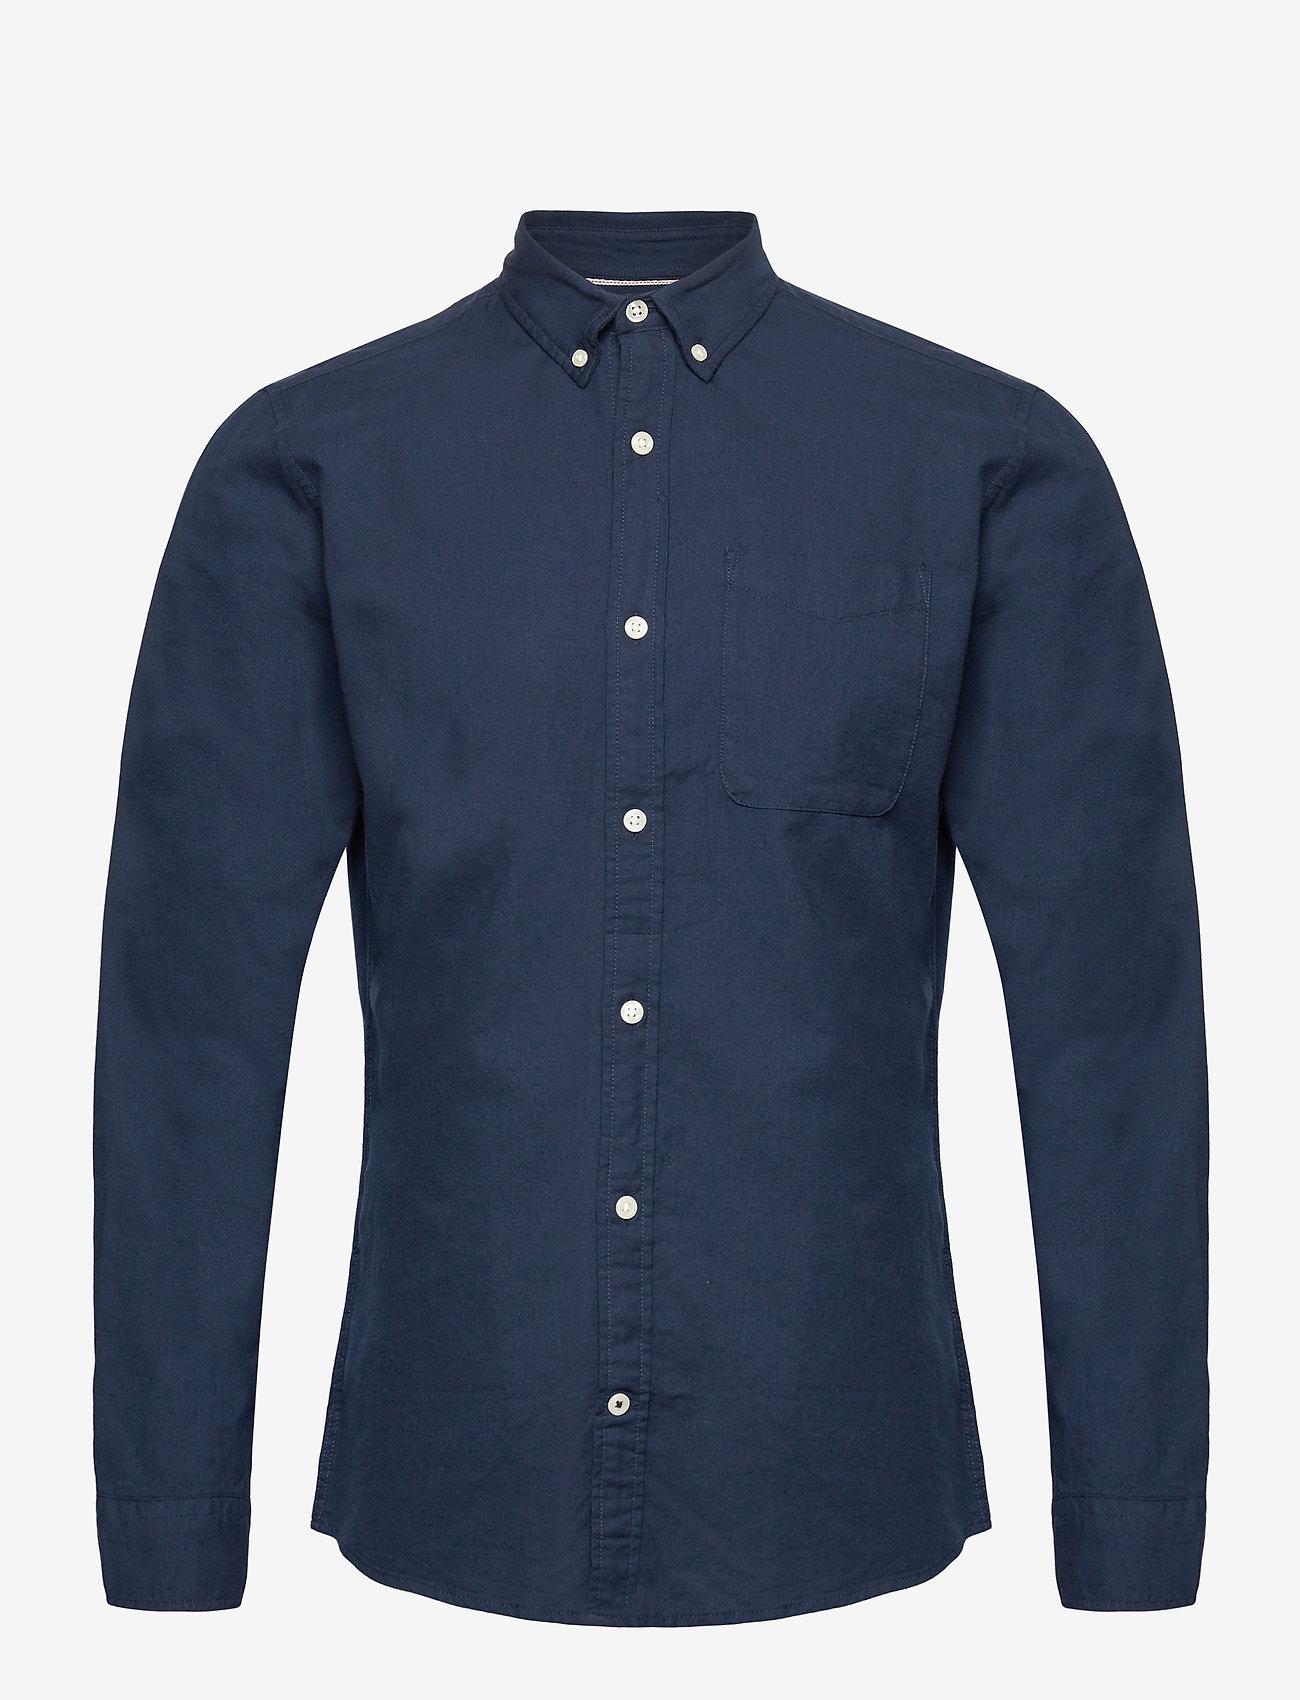 Jack & Jones - JJEOXFORD SHIRT L/S S21 - casual skjortor - navy blazer - 0